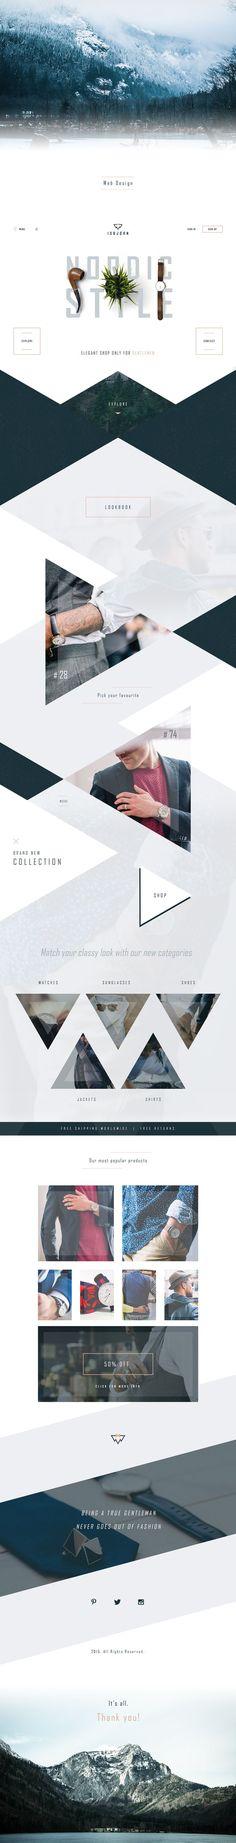 Isbjørn - Gentleman's Store on Web Design Served